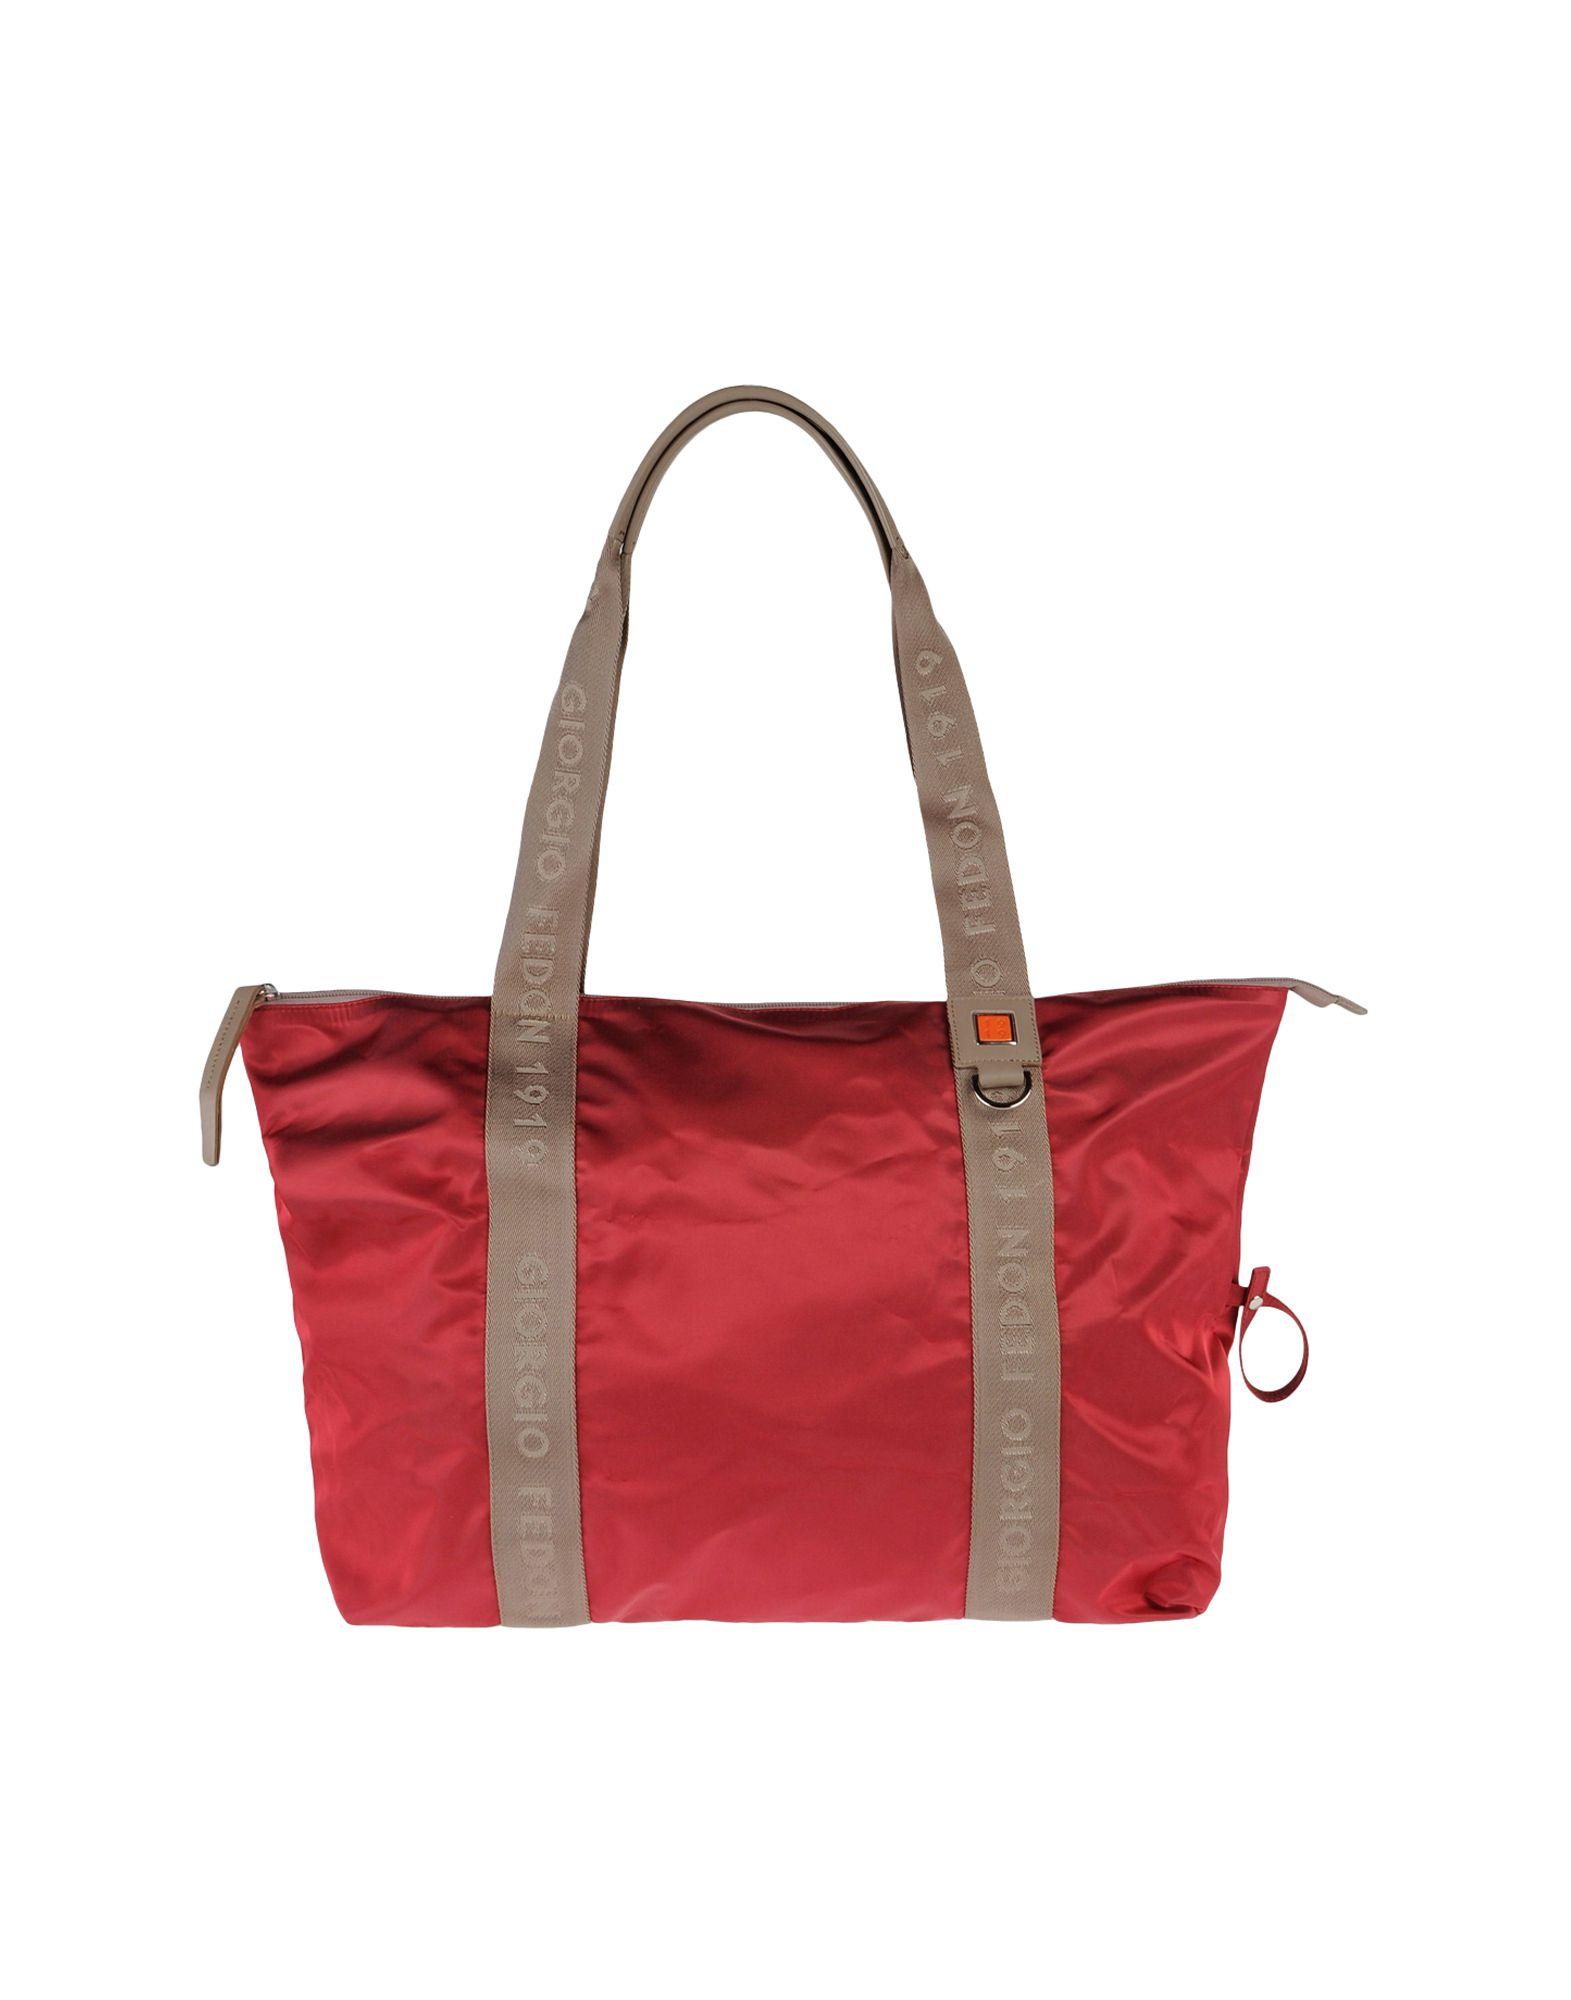 Giorgio fedon Large Fabric Bag in (Garnet)